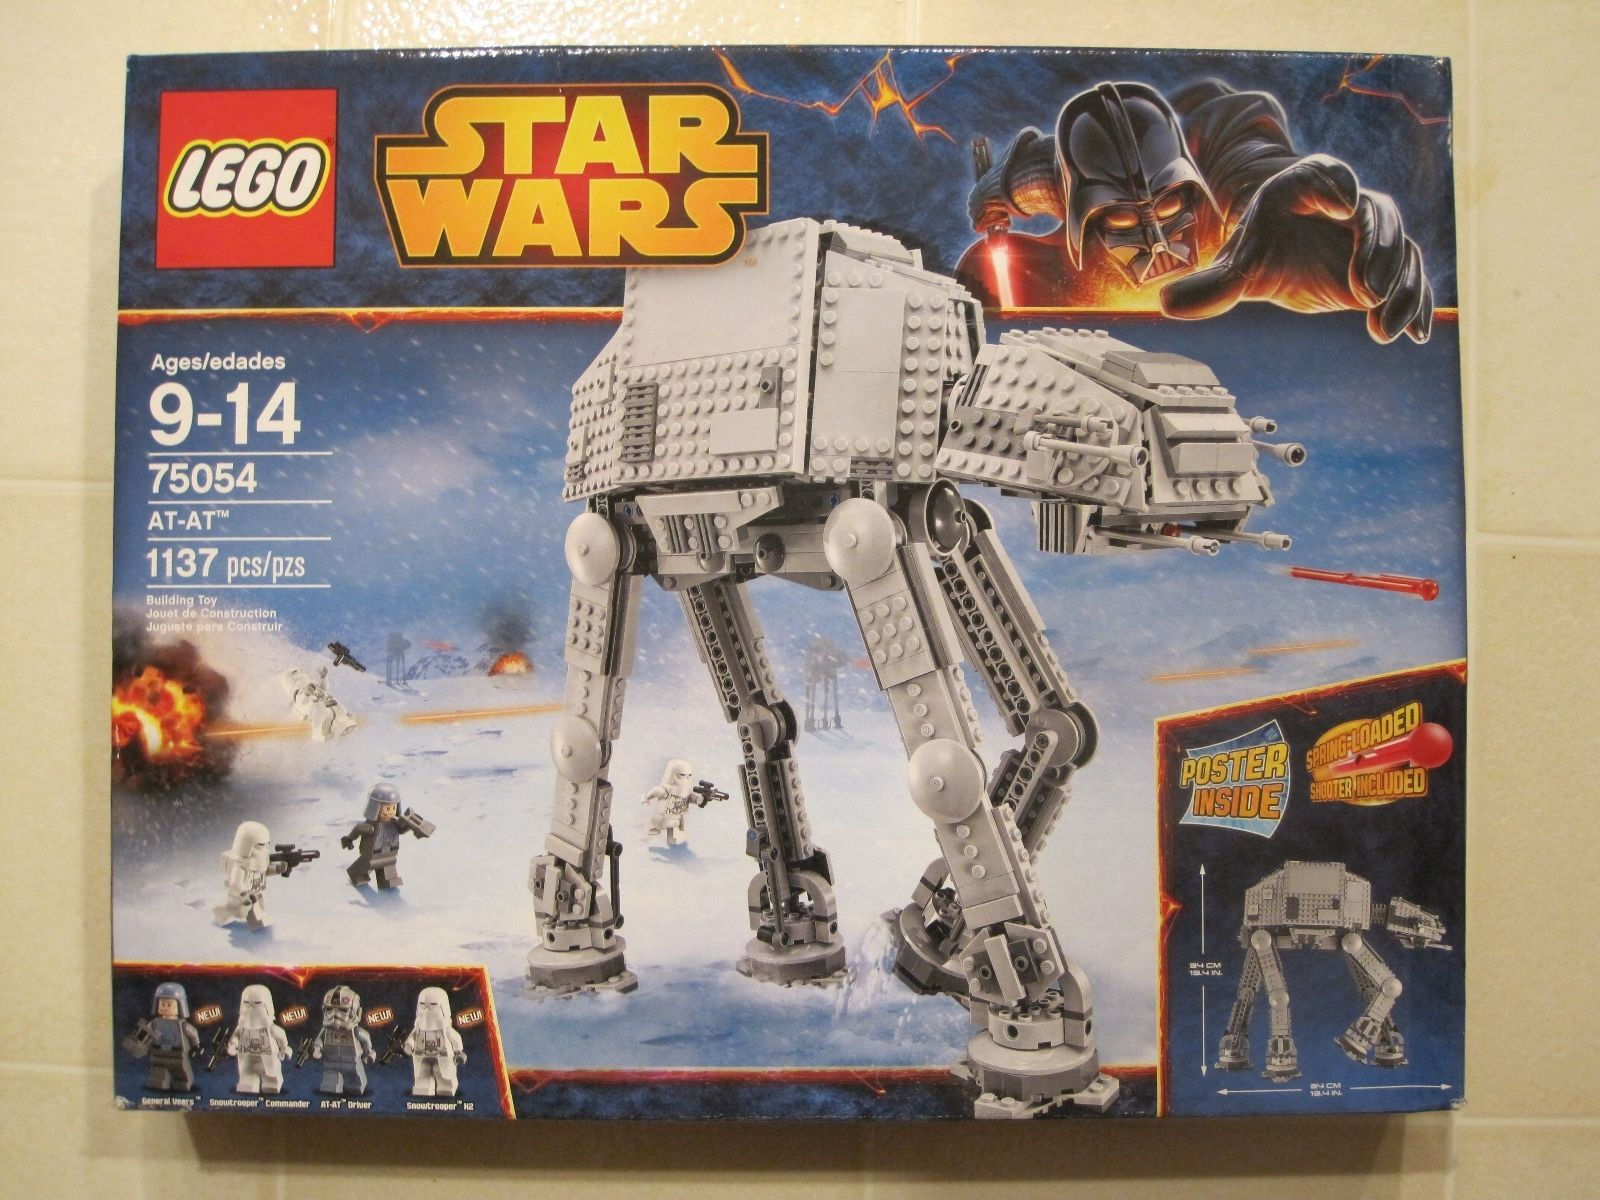 NEW IN BOX LEGO STAR WARS AT-AT BUILDING TOY 75054 https://t.co/9JTtZaxSUt https://t.co/KsEA5hIu3u